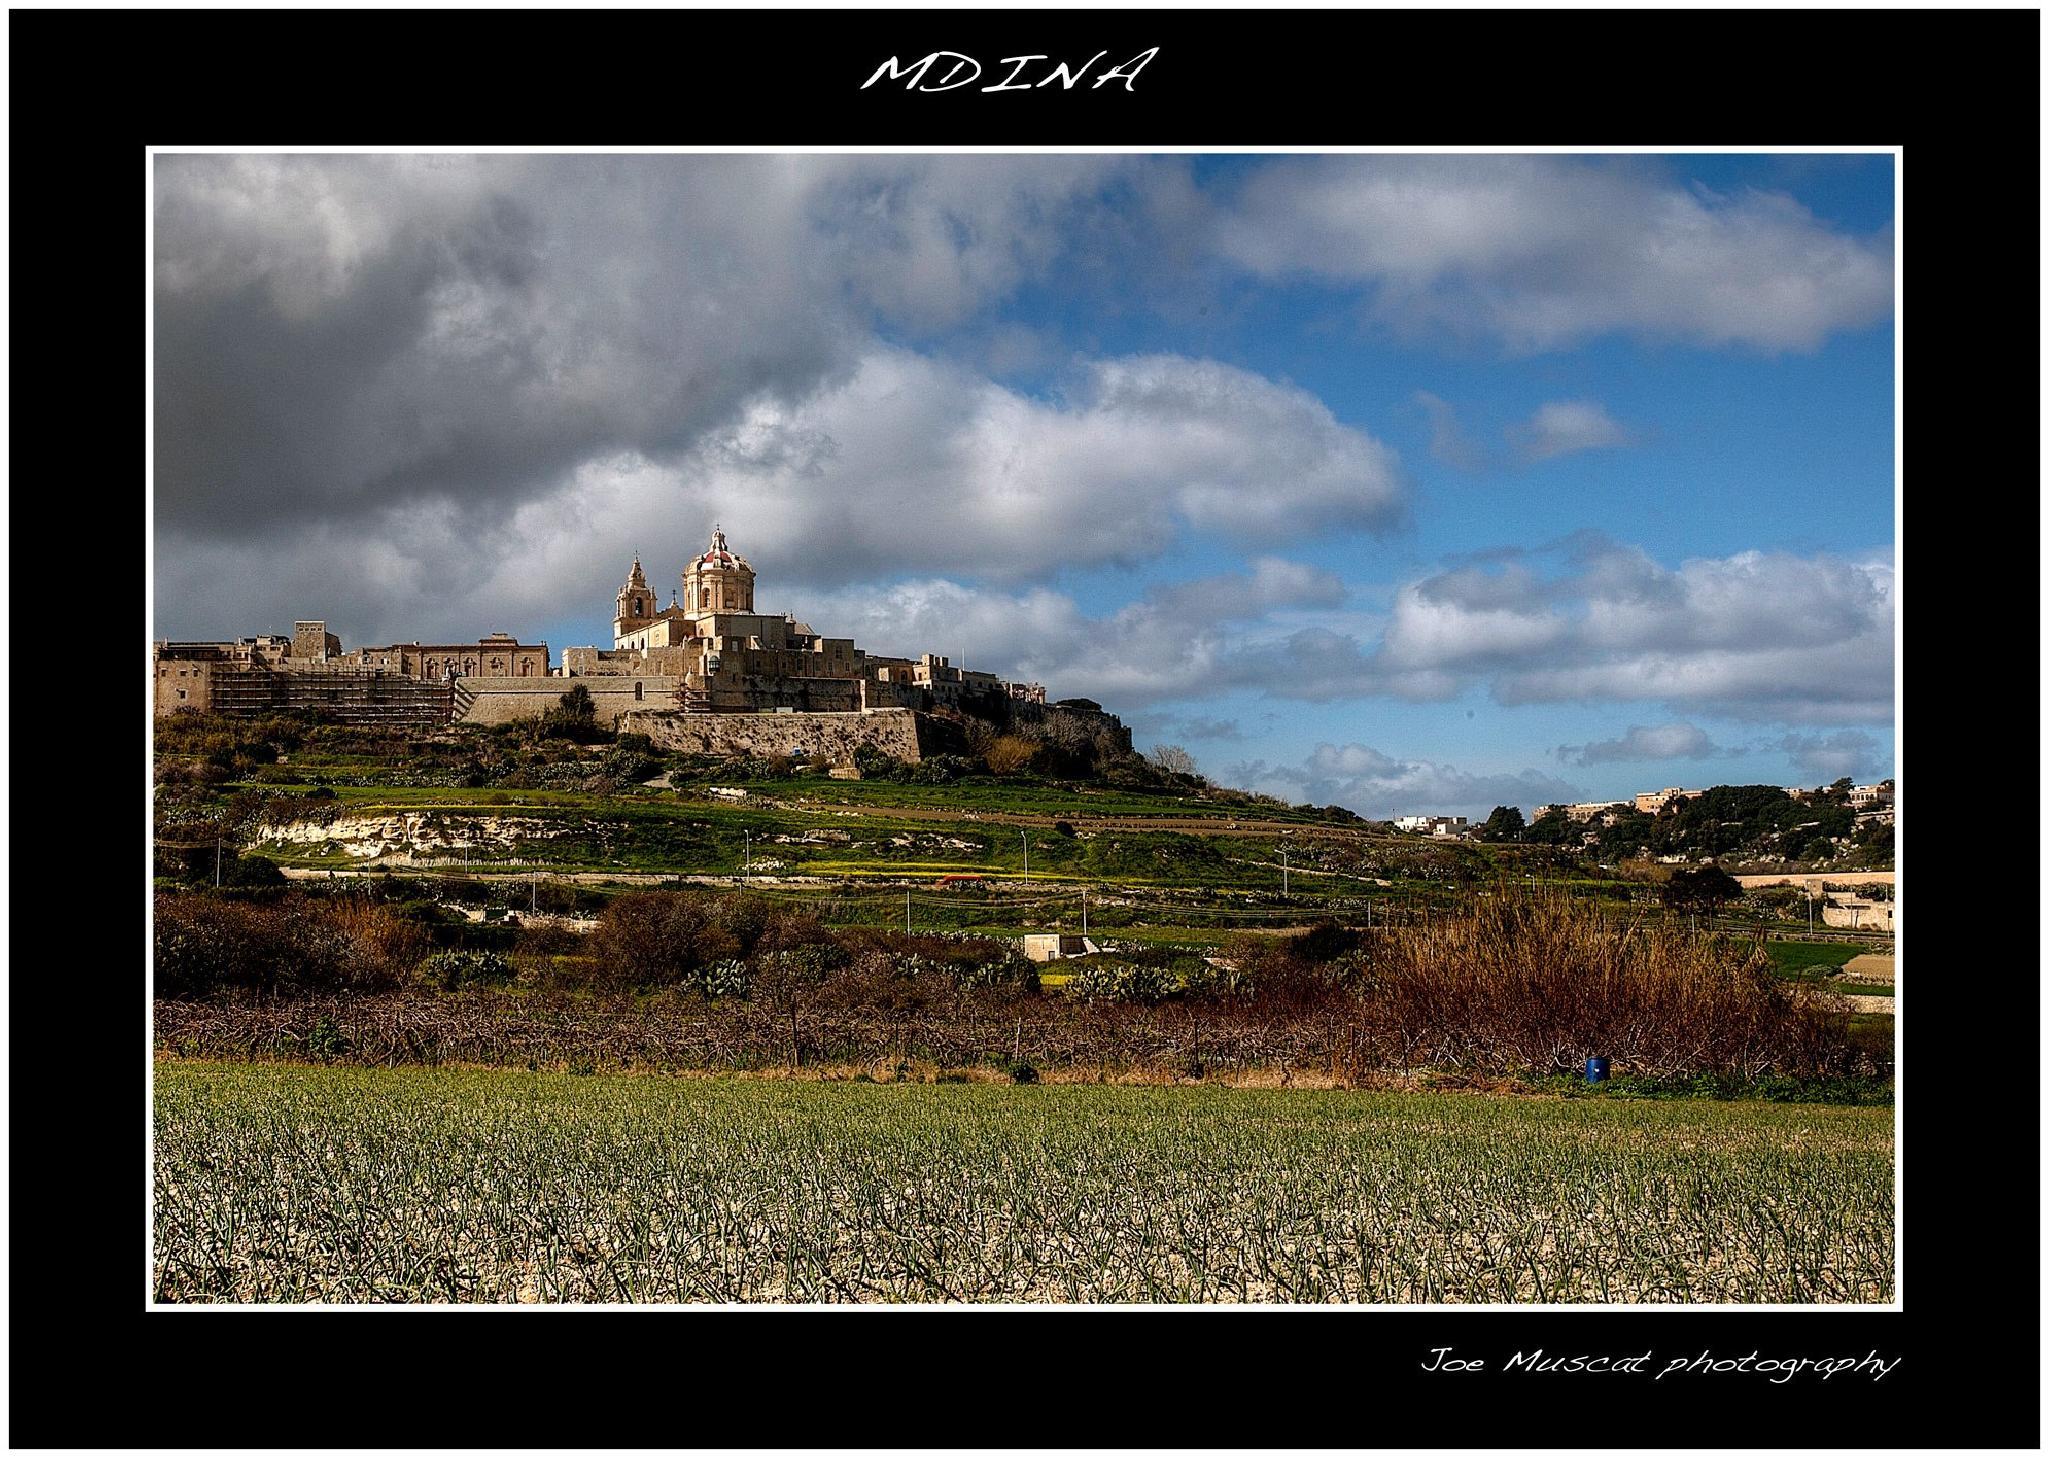 The silent city of Mdina - Malta by Joe Muscat